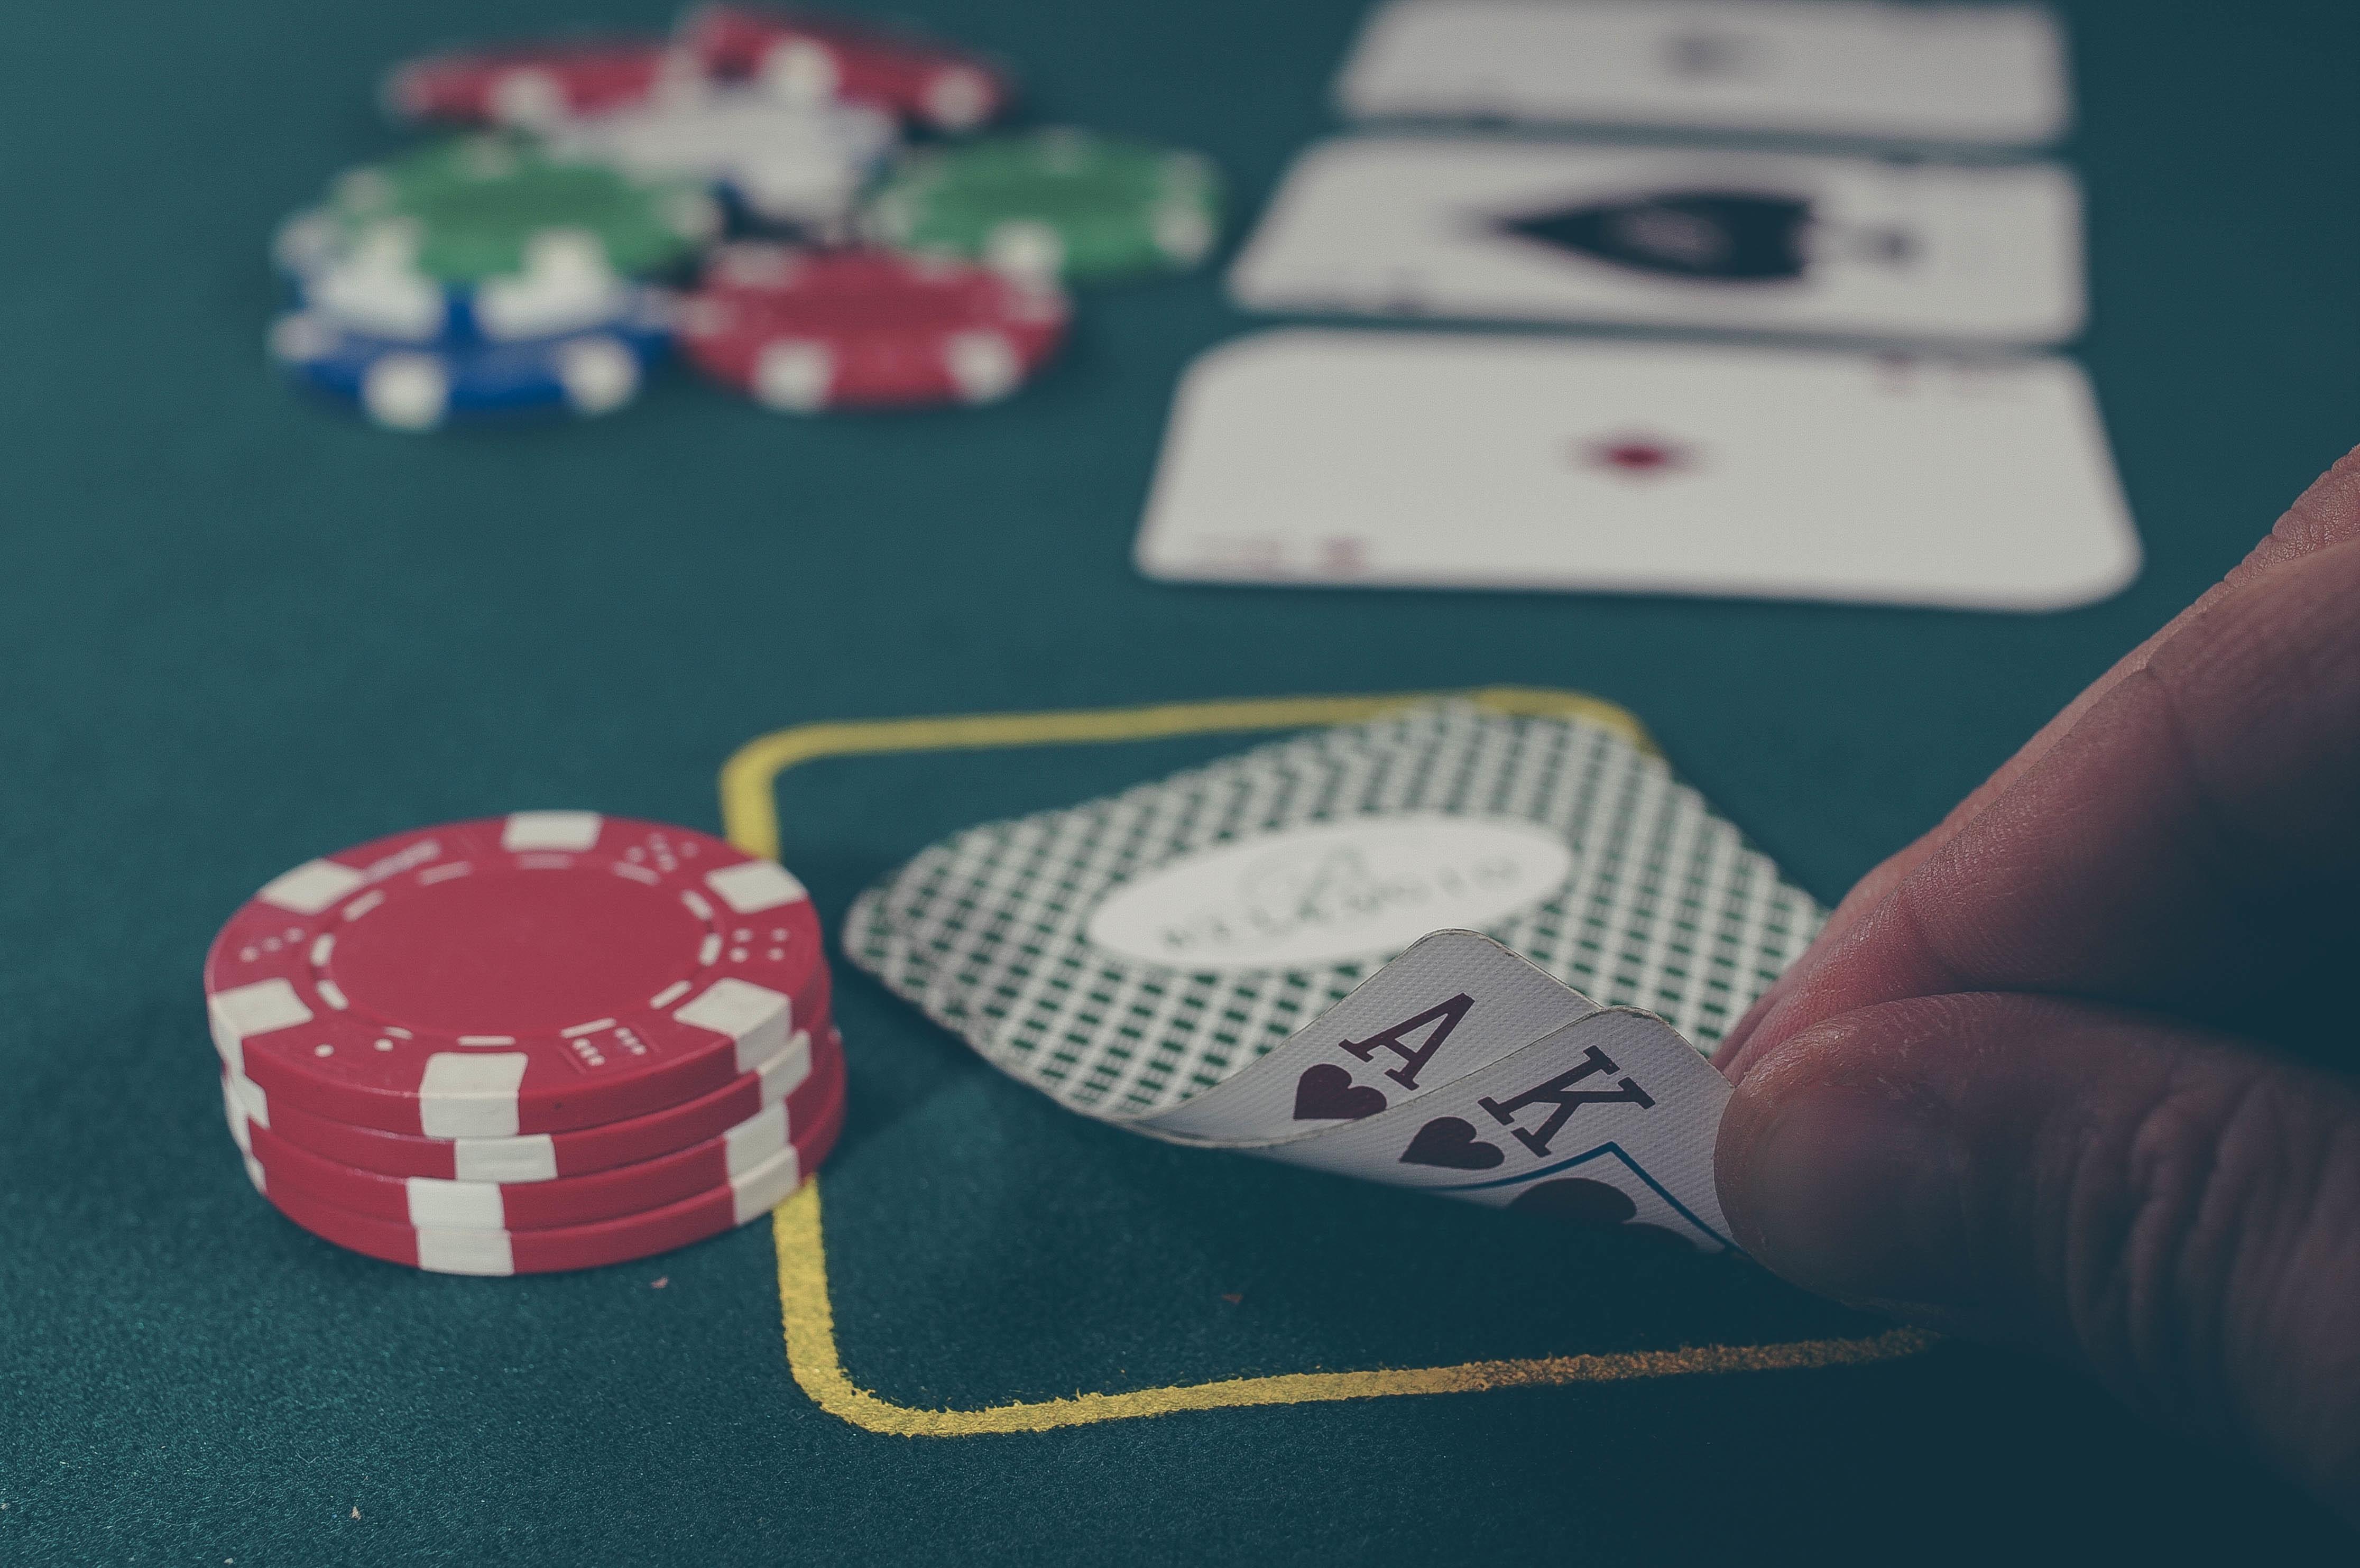 https://get.pxhere.com/photo/recreation-ace-gamble-king-gambling-games-poker-card-game-22749.jpg